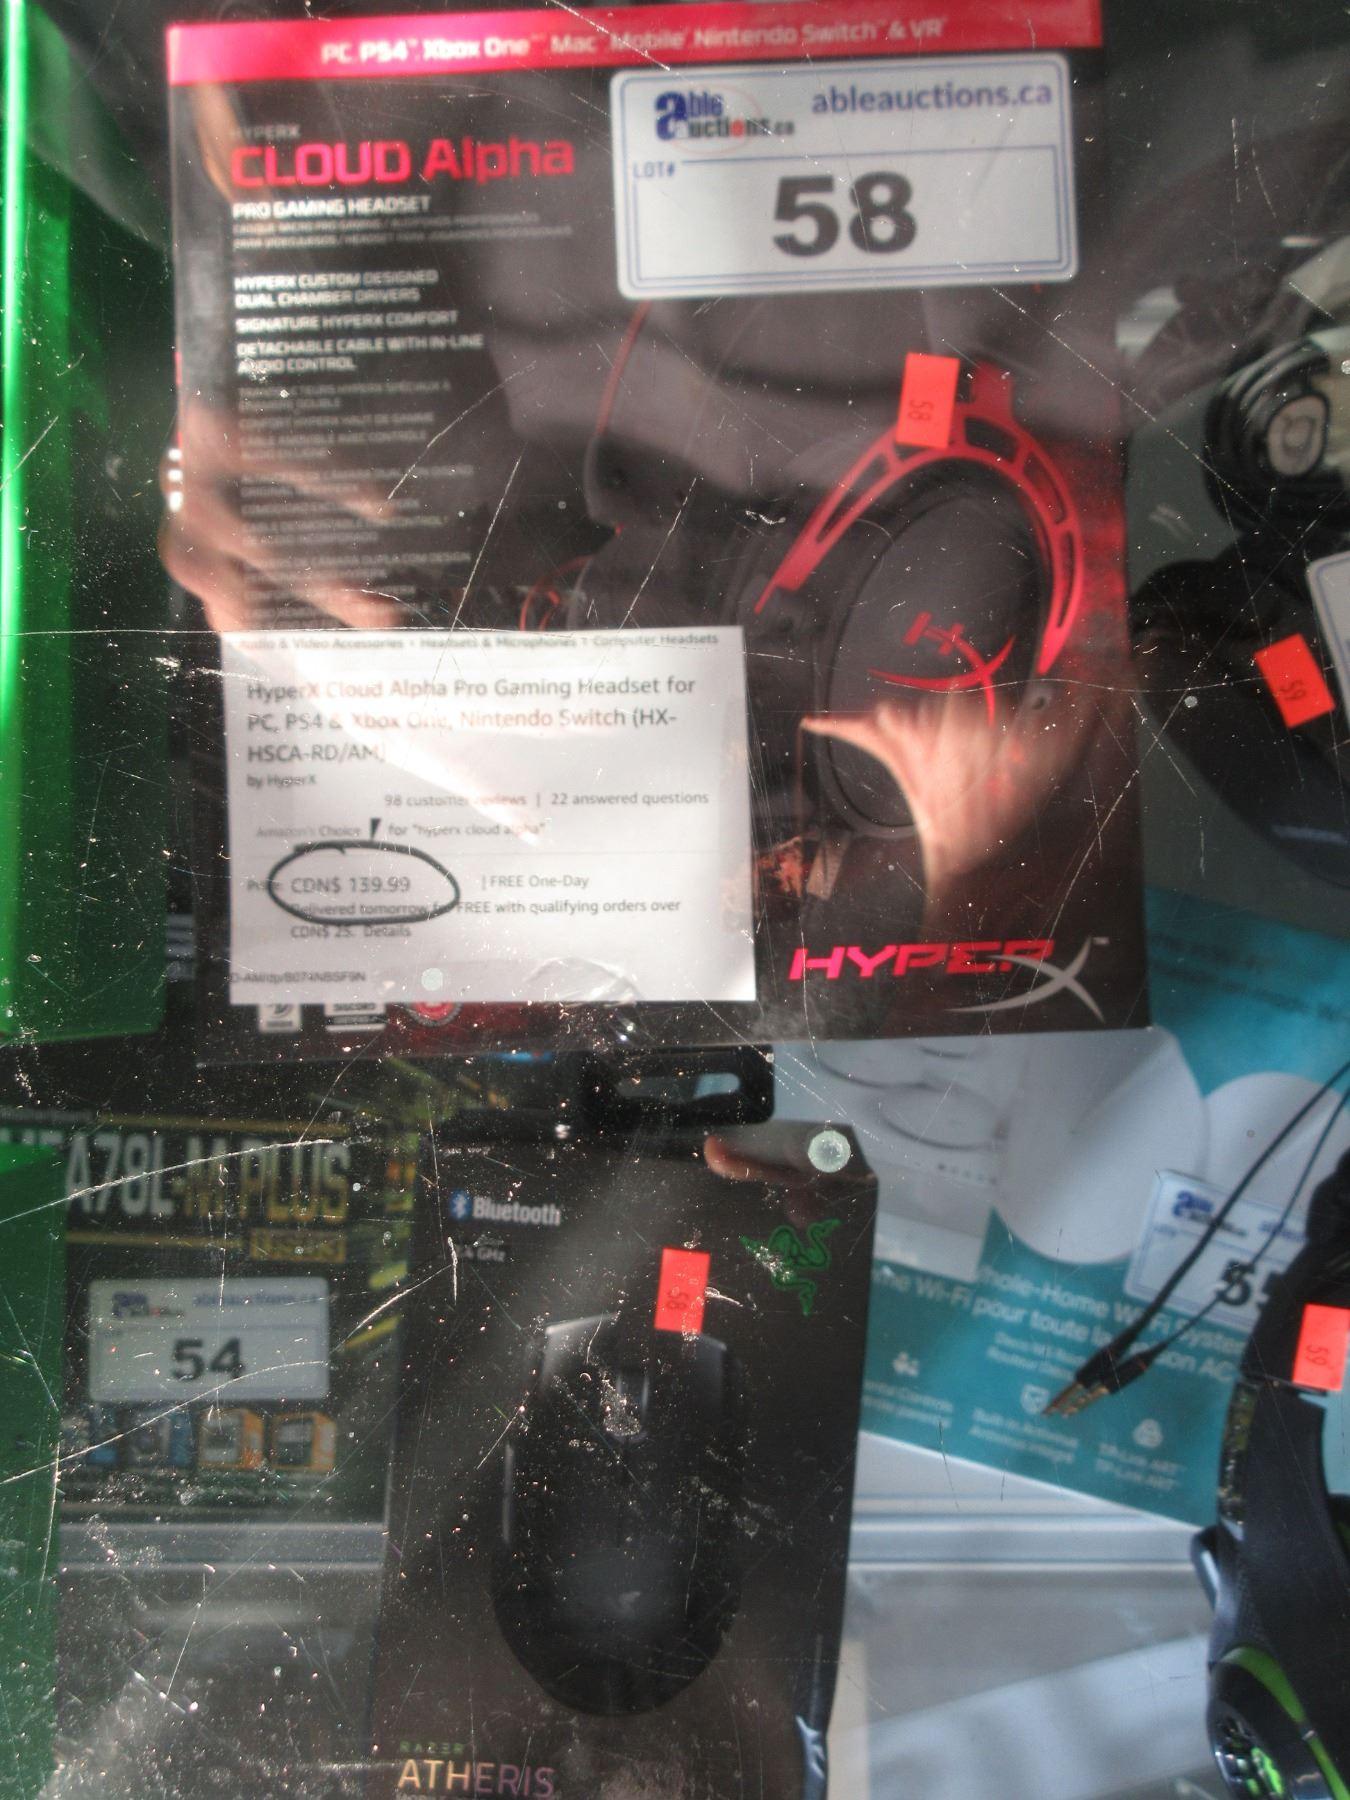 hyperx cloud alpha pro gaming headset & razer atheris